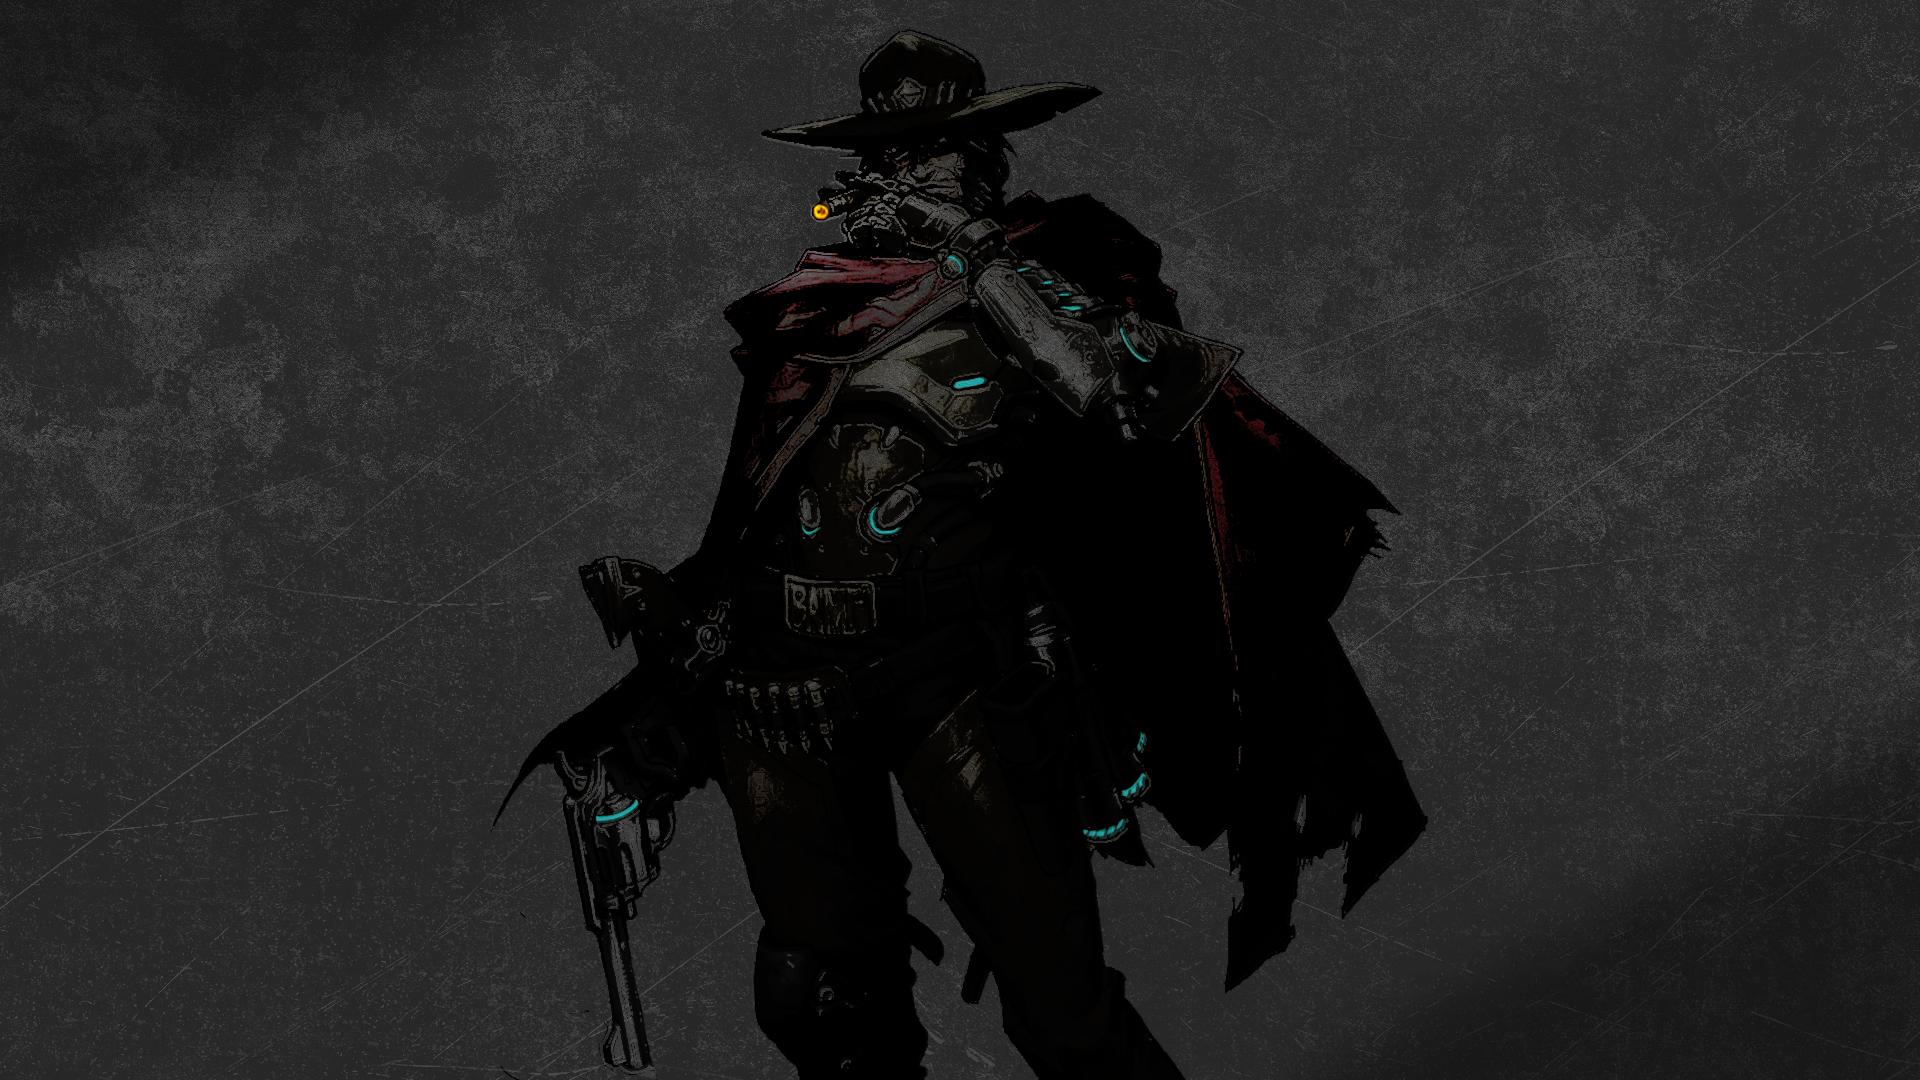 General 1920x1080 Overwatch McCree (Overwatch) Blizzard Entertainment